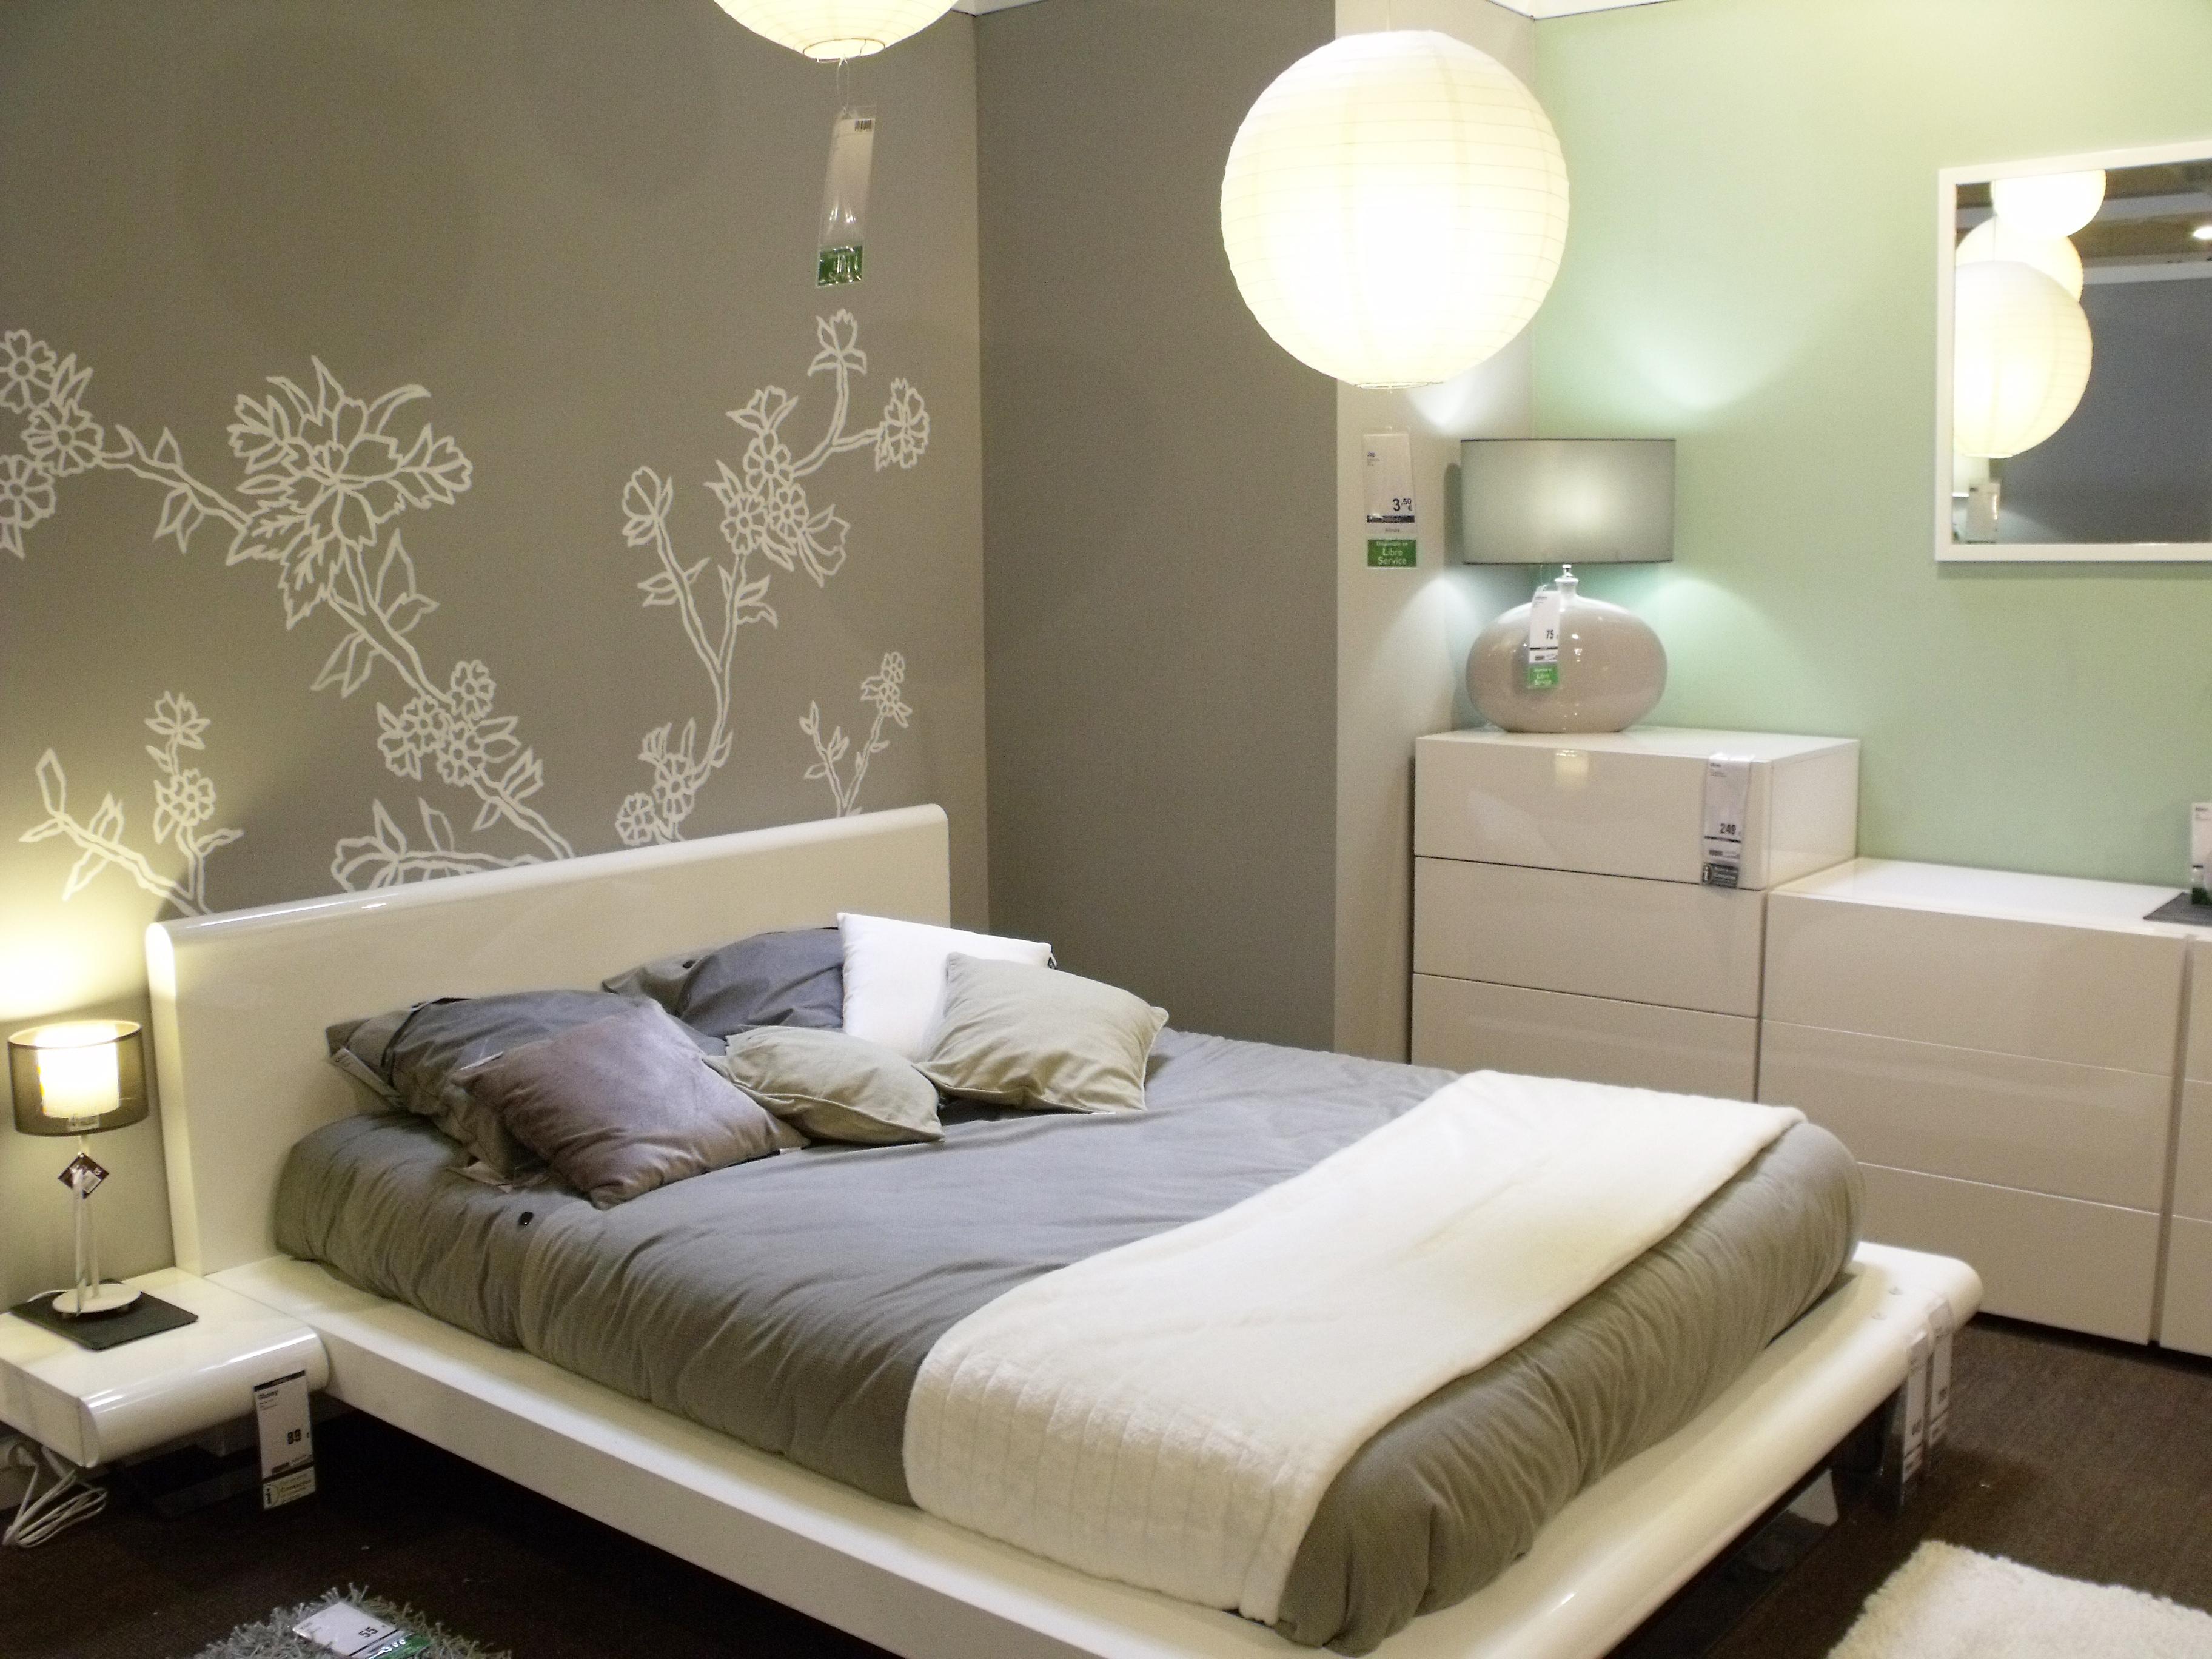 Dcoration dune chambre  coucher apaisante